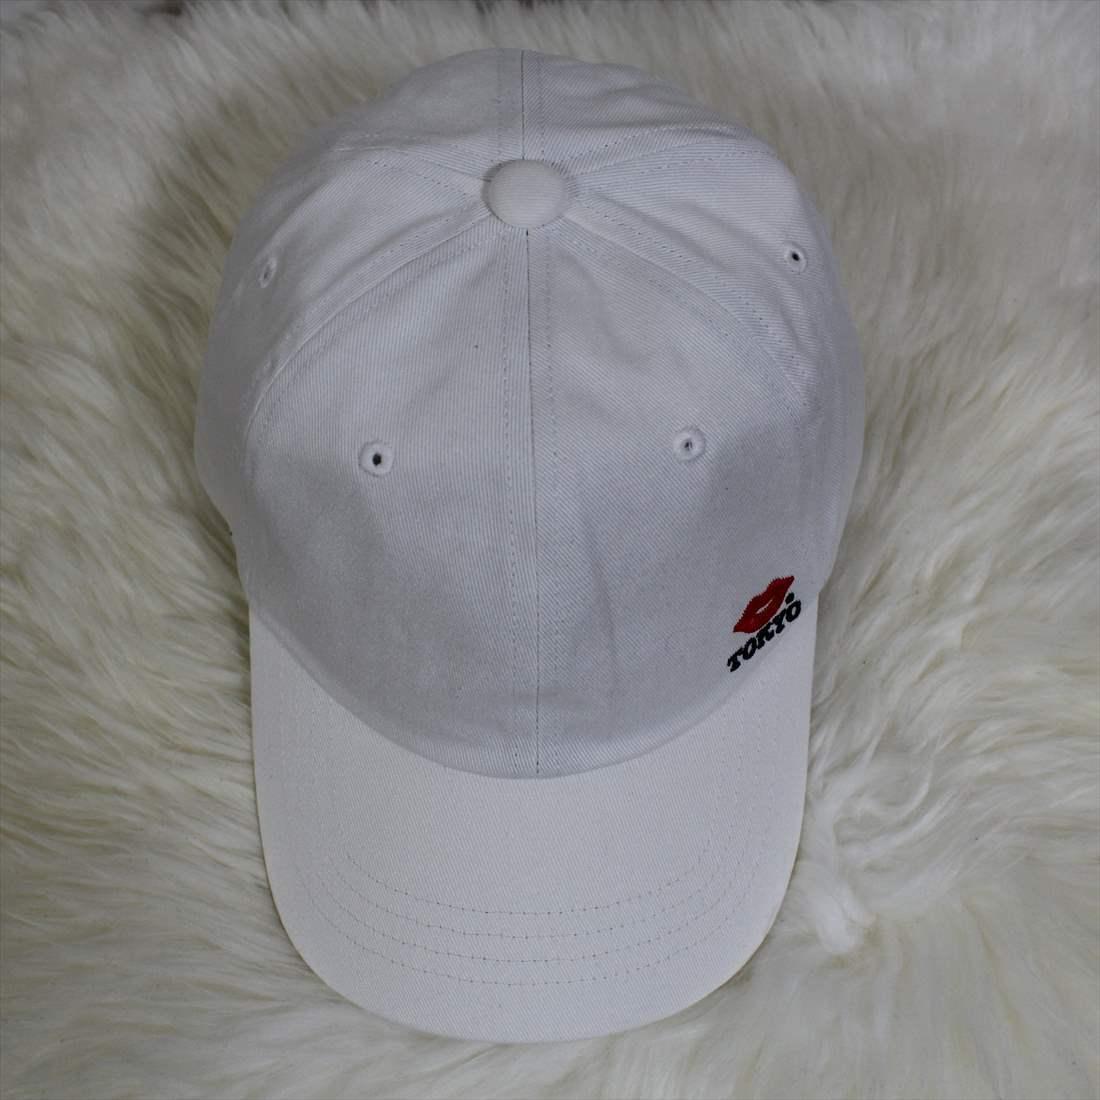 KISS TOKYO LIP LOGO LOW CAP サイドロゴ刺繍 ホワイト キャップ 新品 白 帽子_画像3